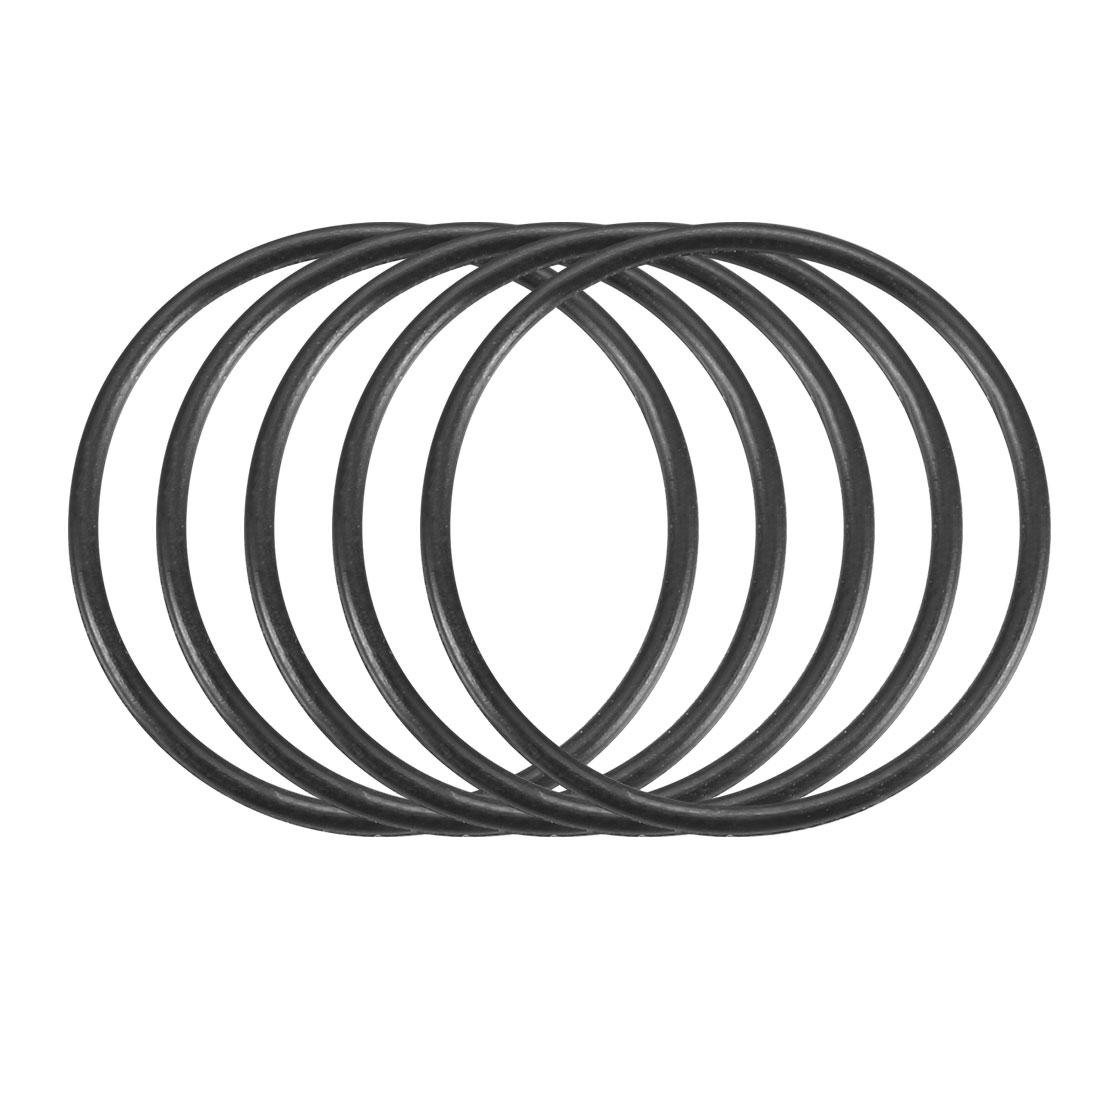 100Pcs Black 24mm x 1.2mm Nitrile Rubber O Ring NBR Oil Sealing Grommets